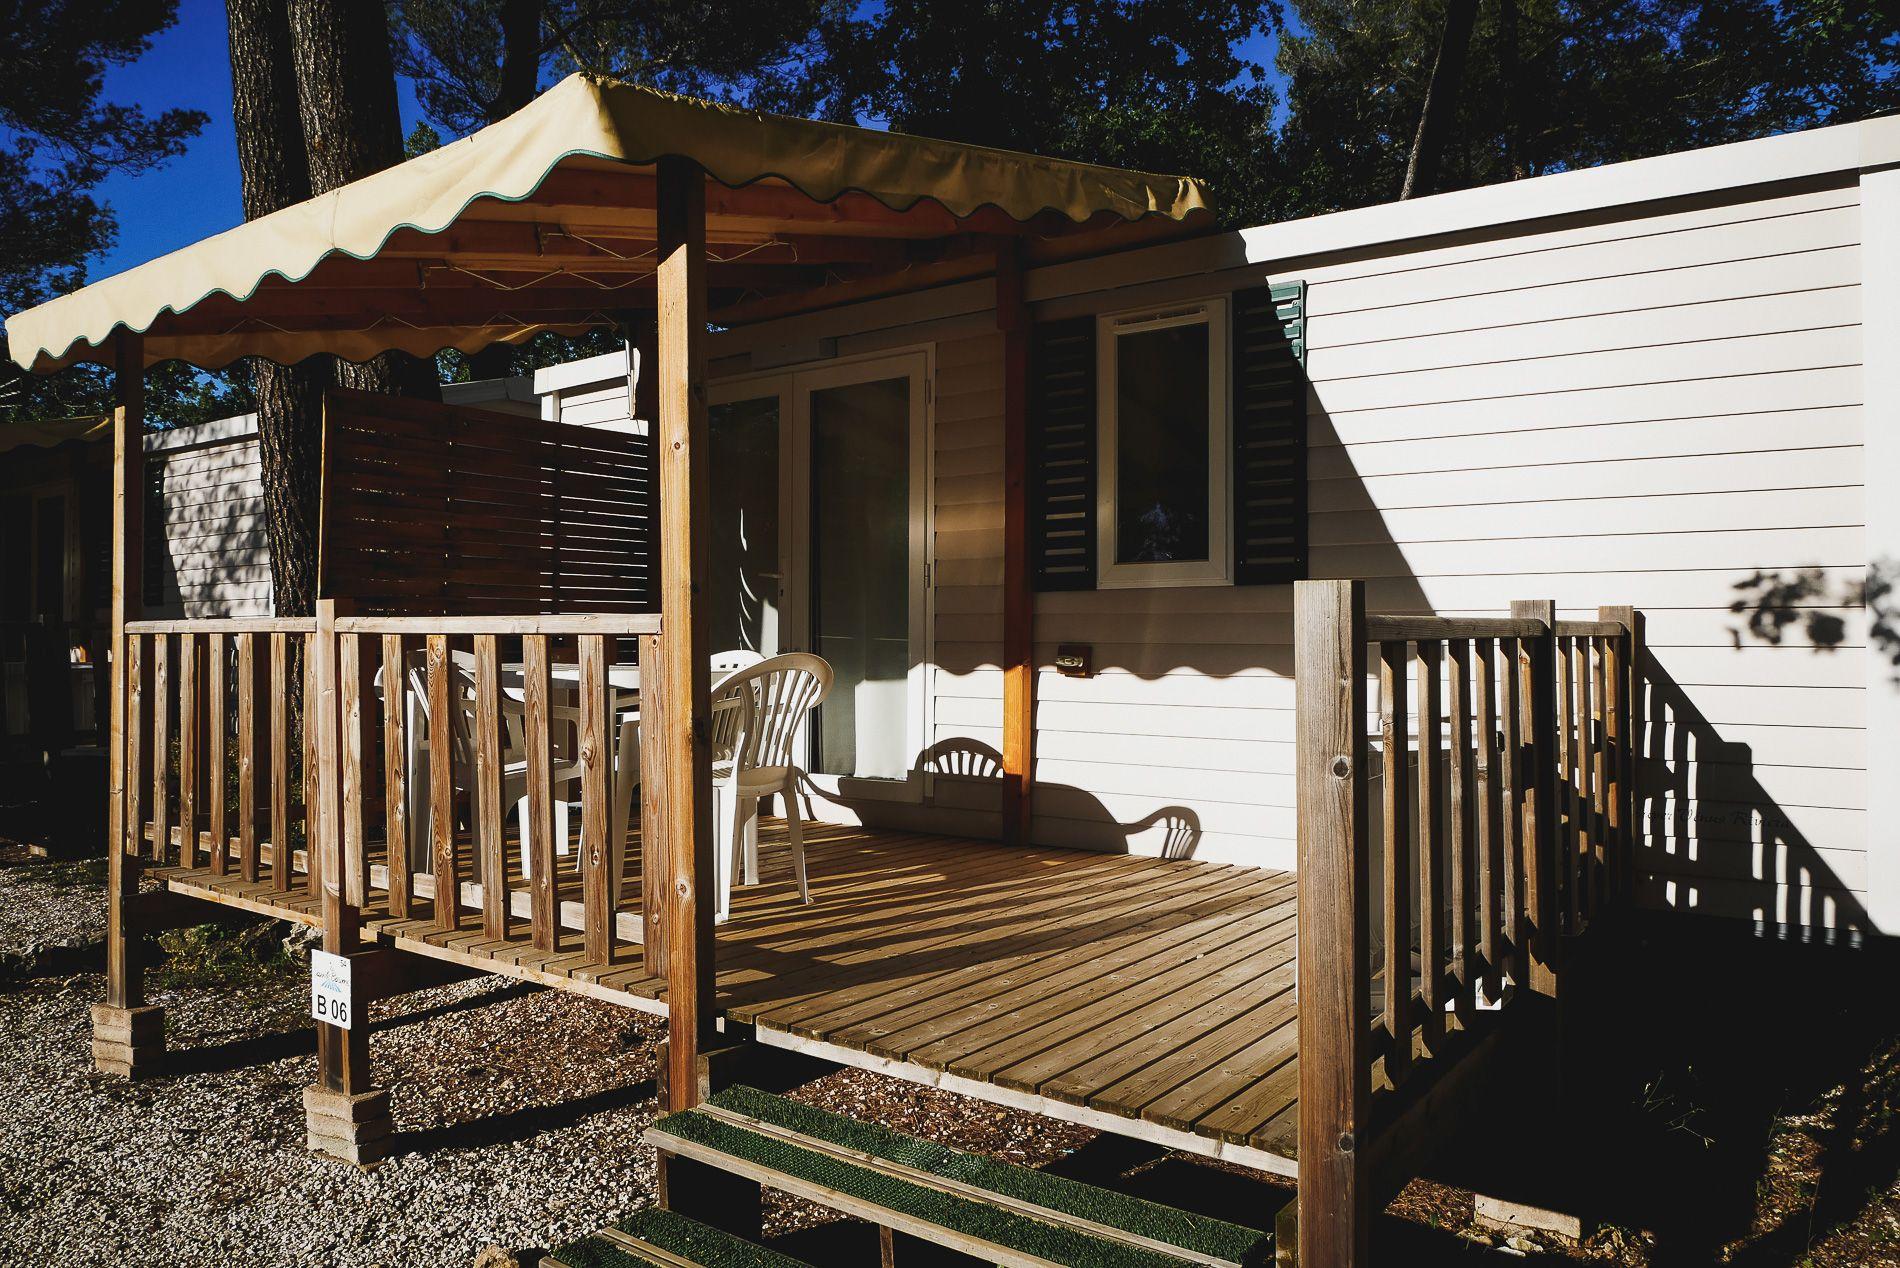 Camping | Massif de la Sainte-Baume | Provence | mademoiselle-voyage